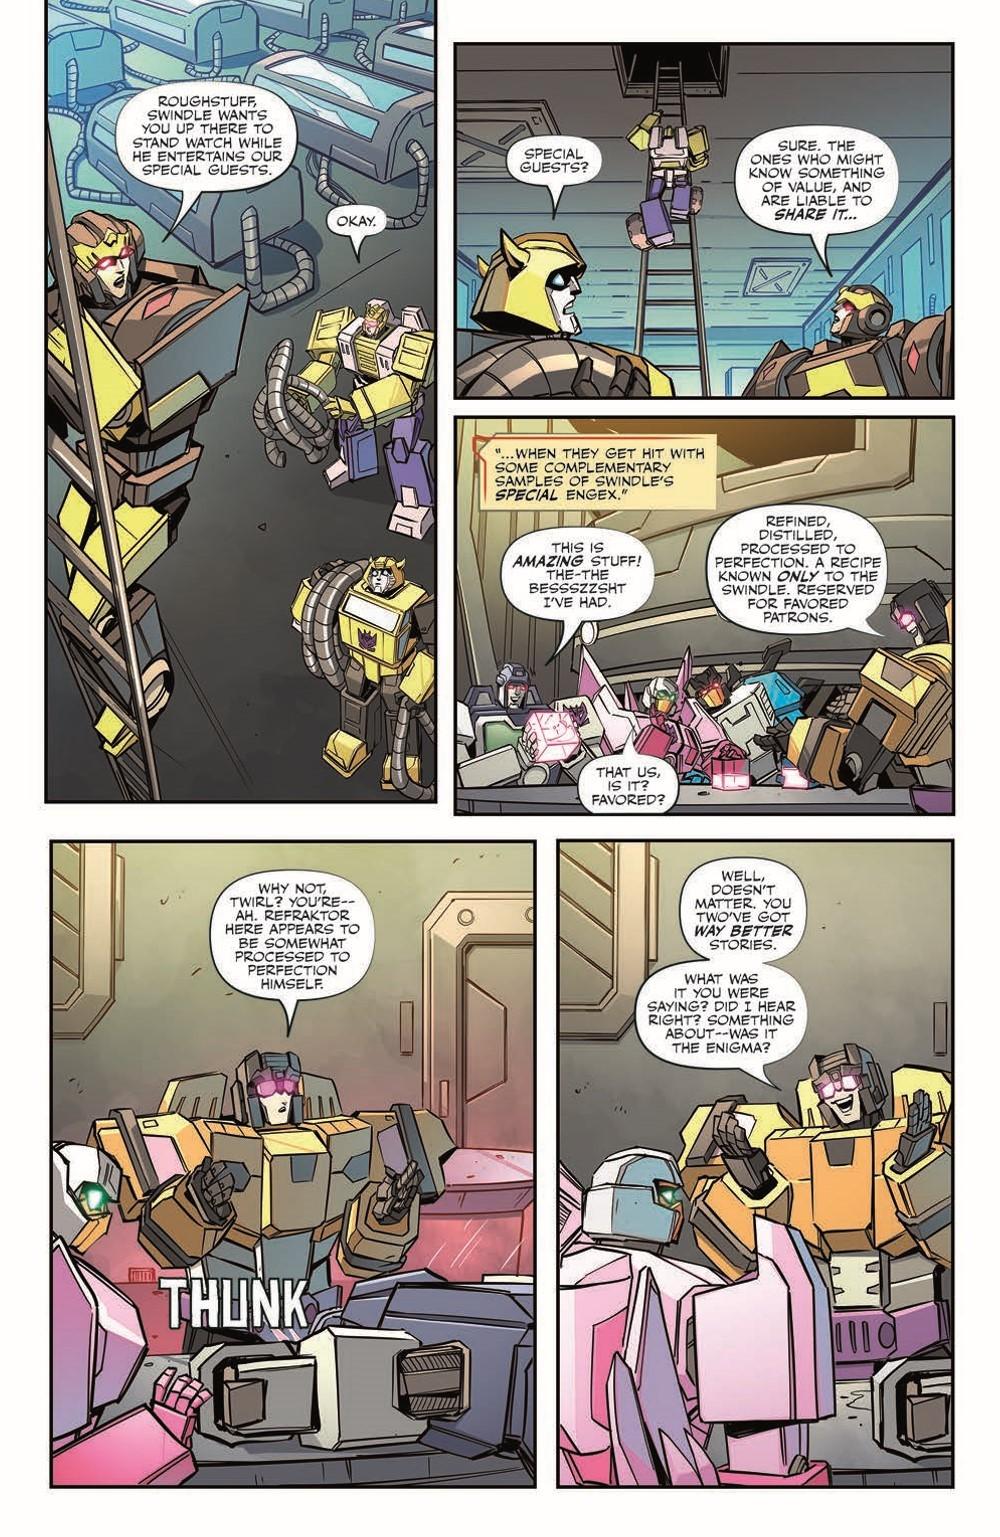 TF33-pr-7 ComicList Previews: TRANSFORMERS #33